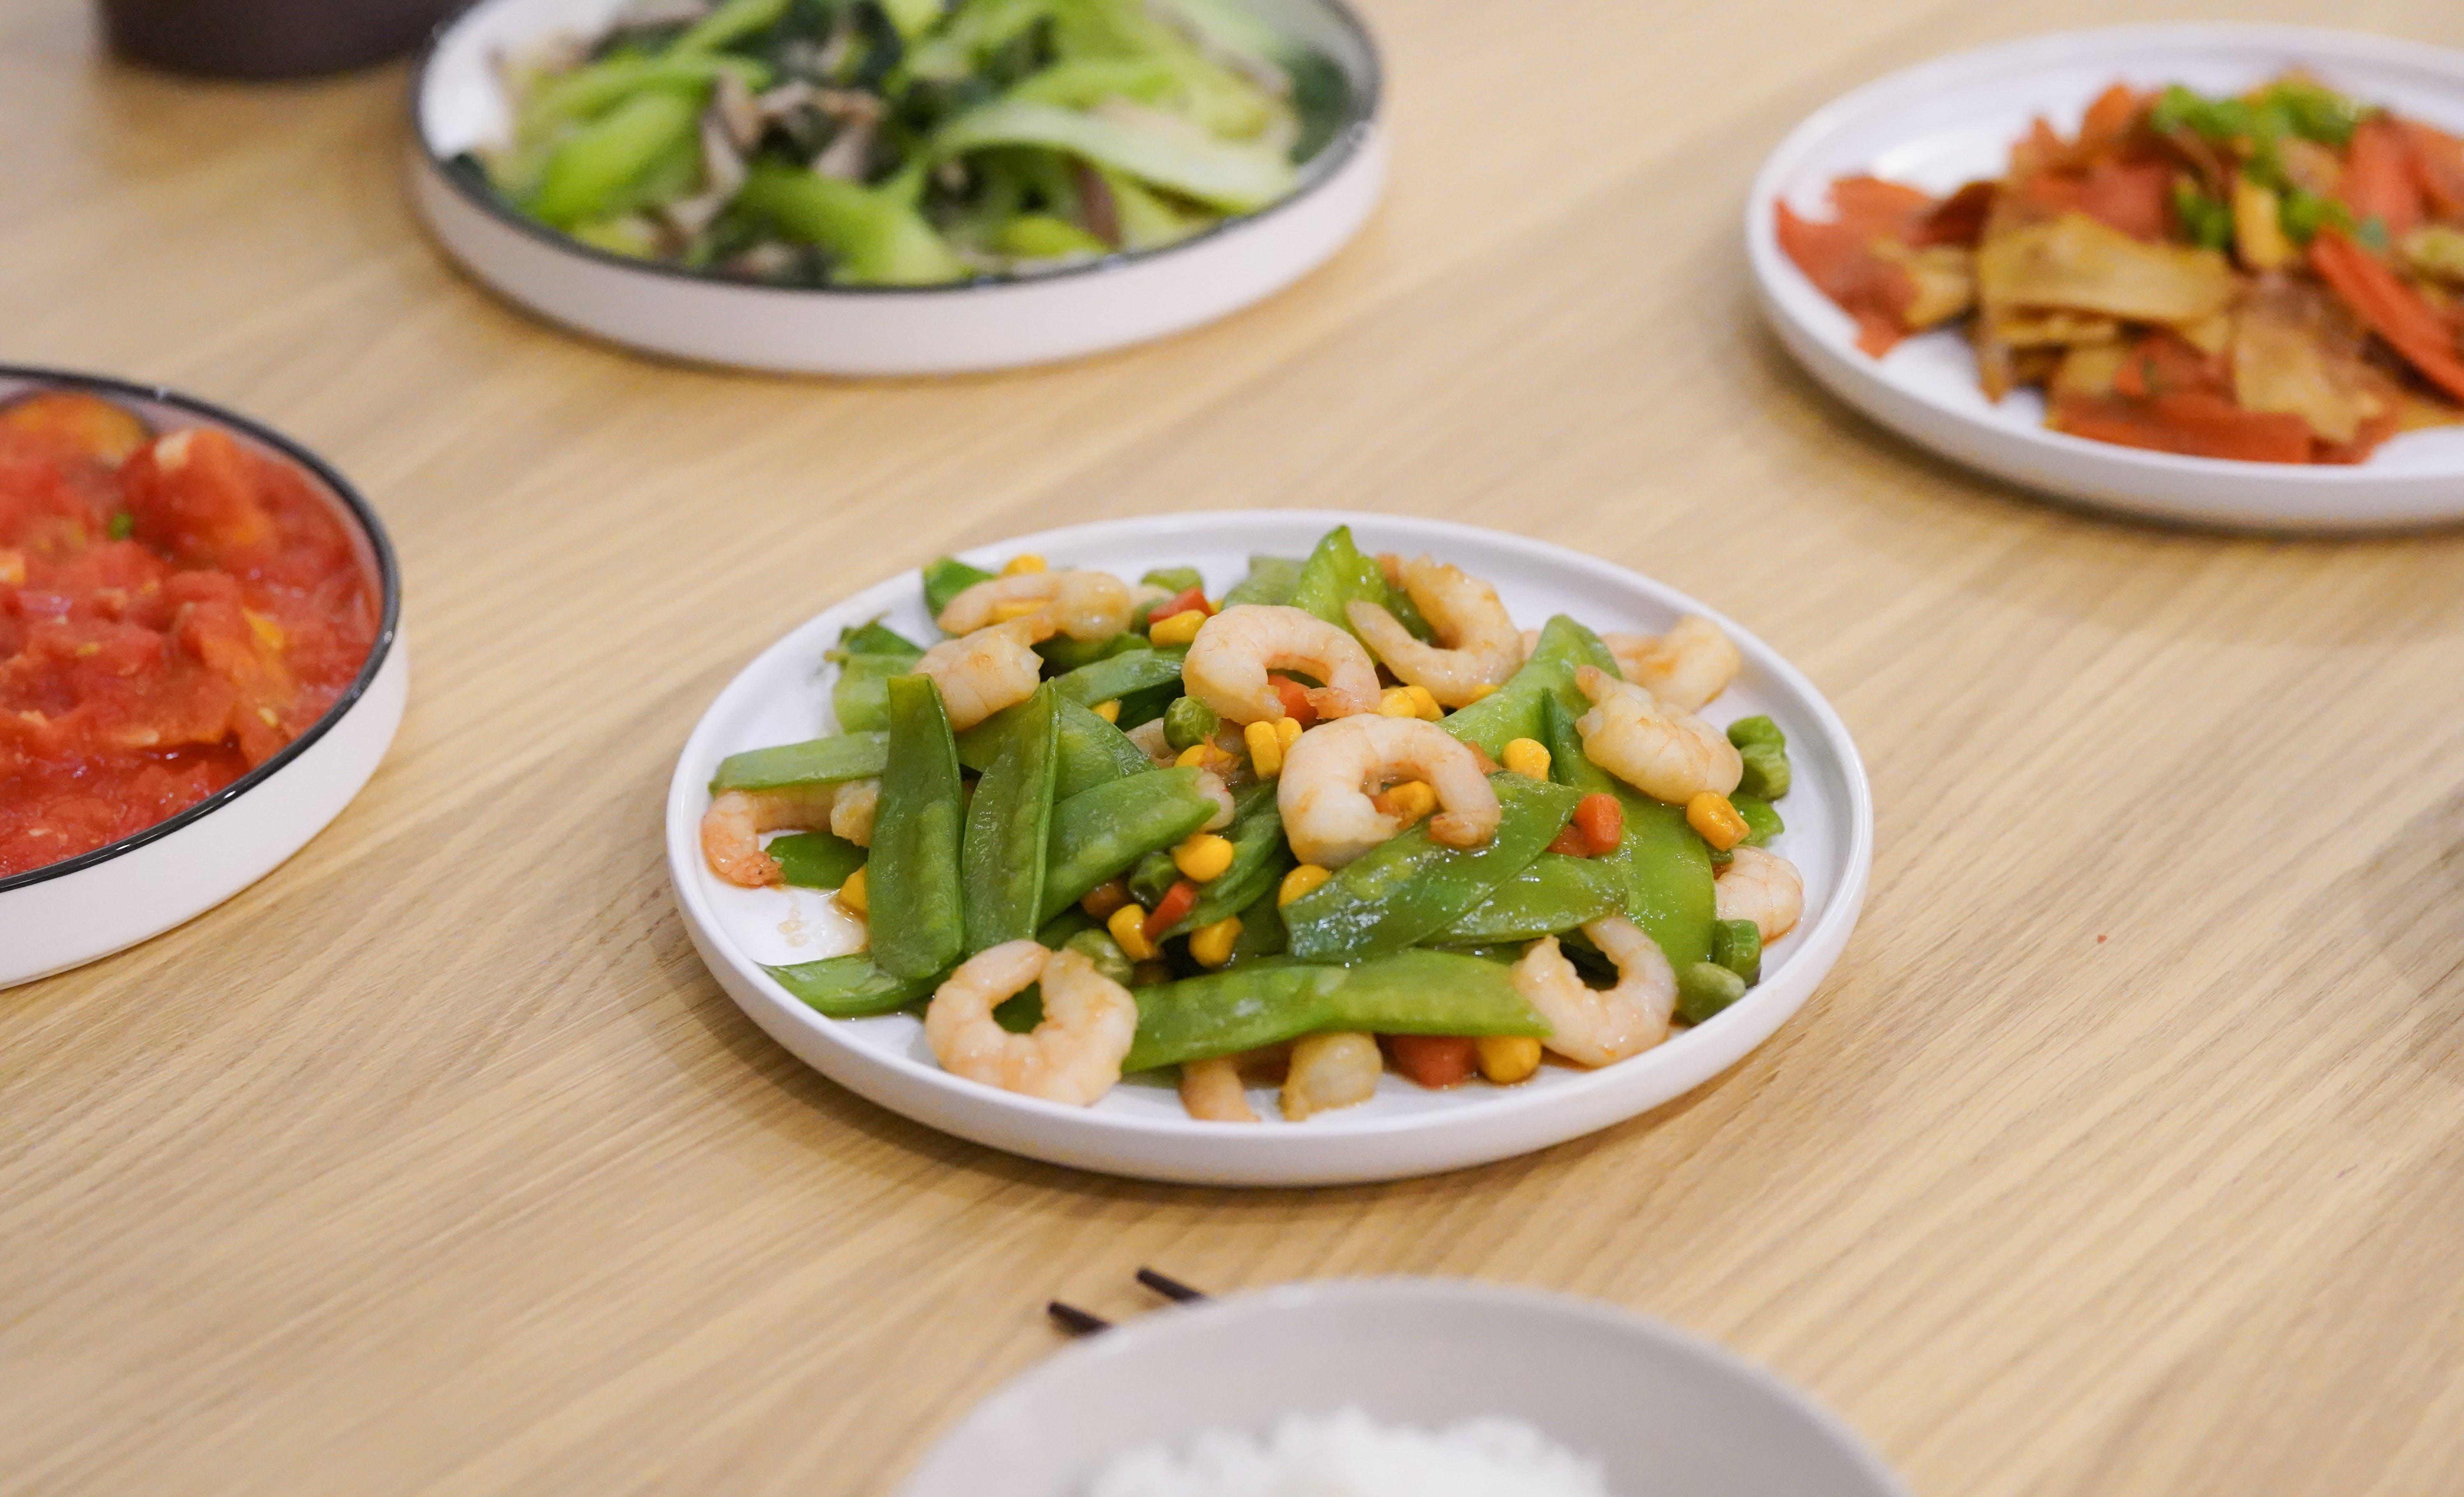 Fotos de stock gratuitas de comida